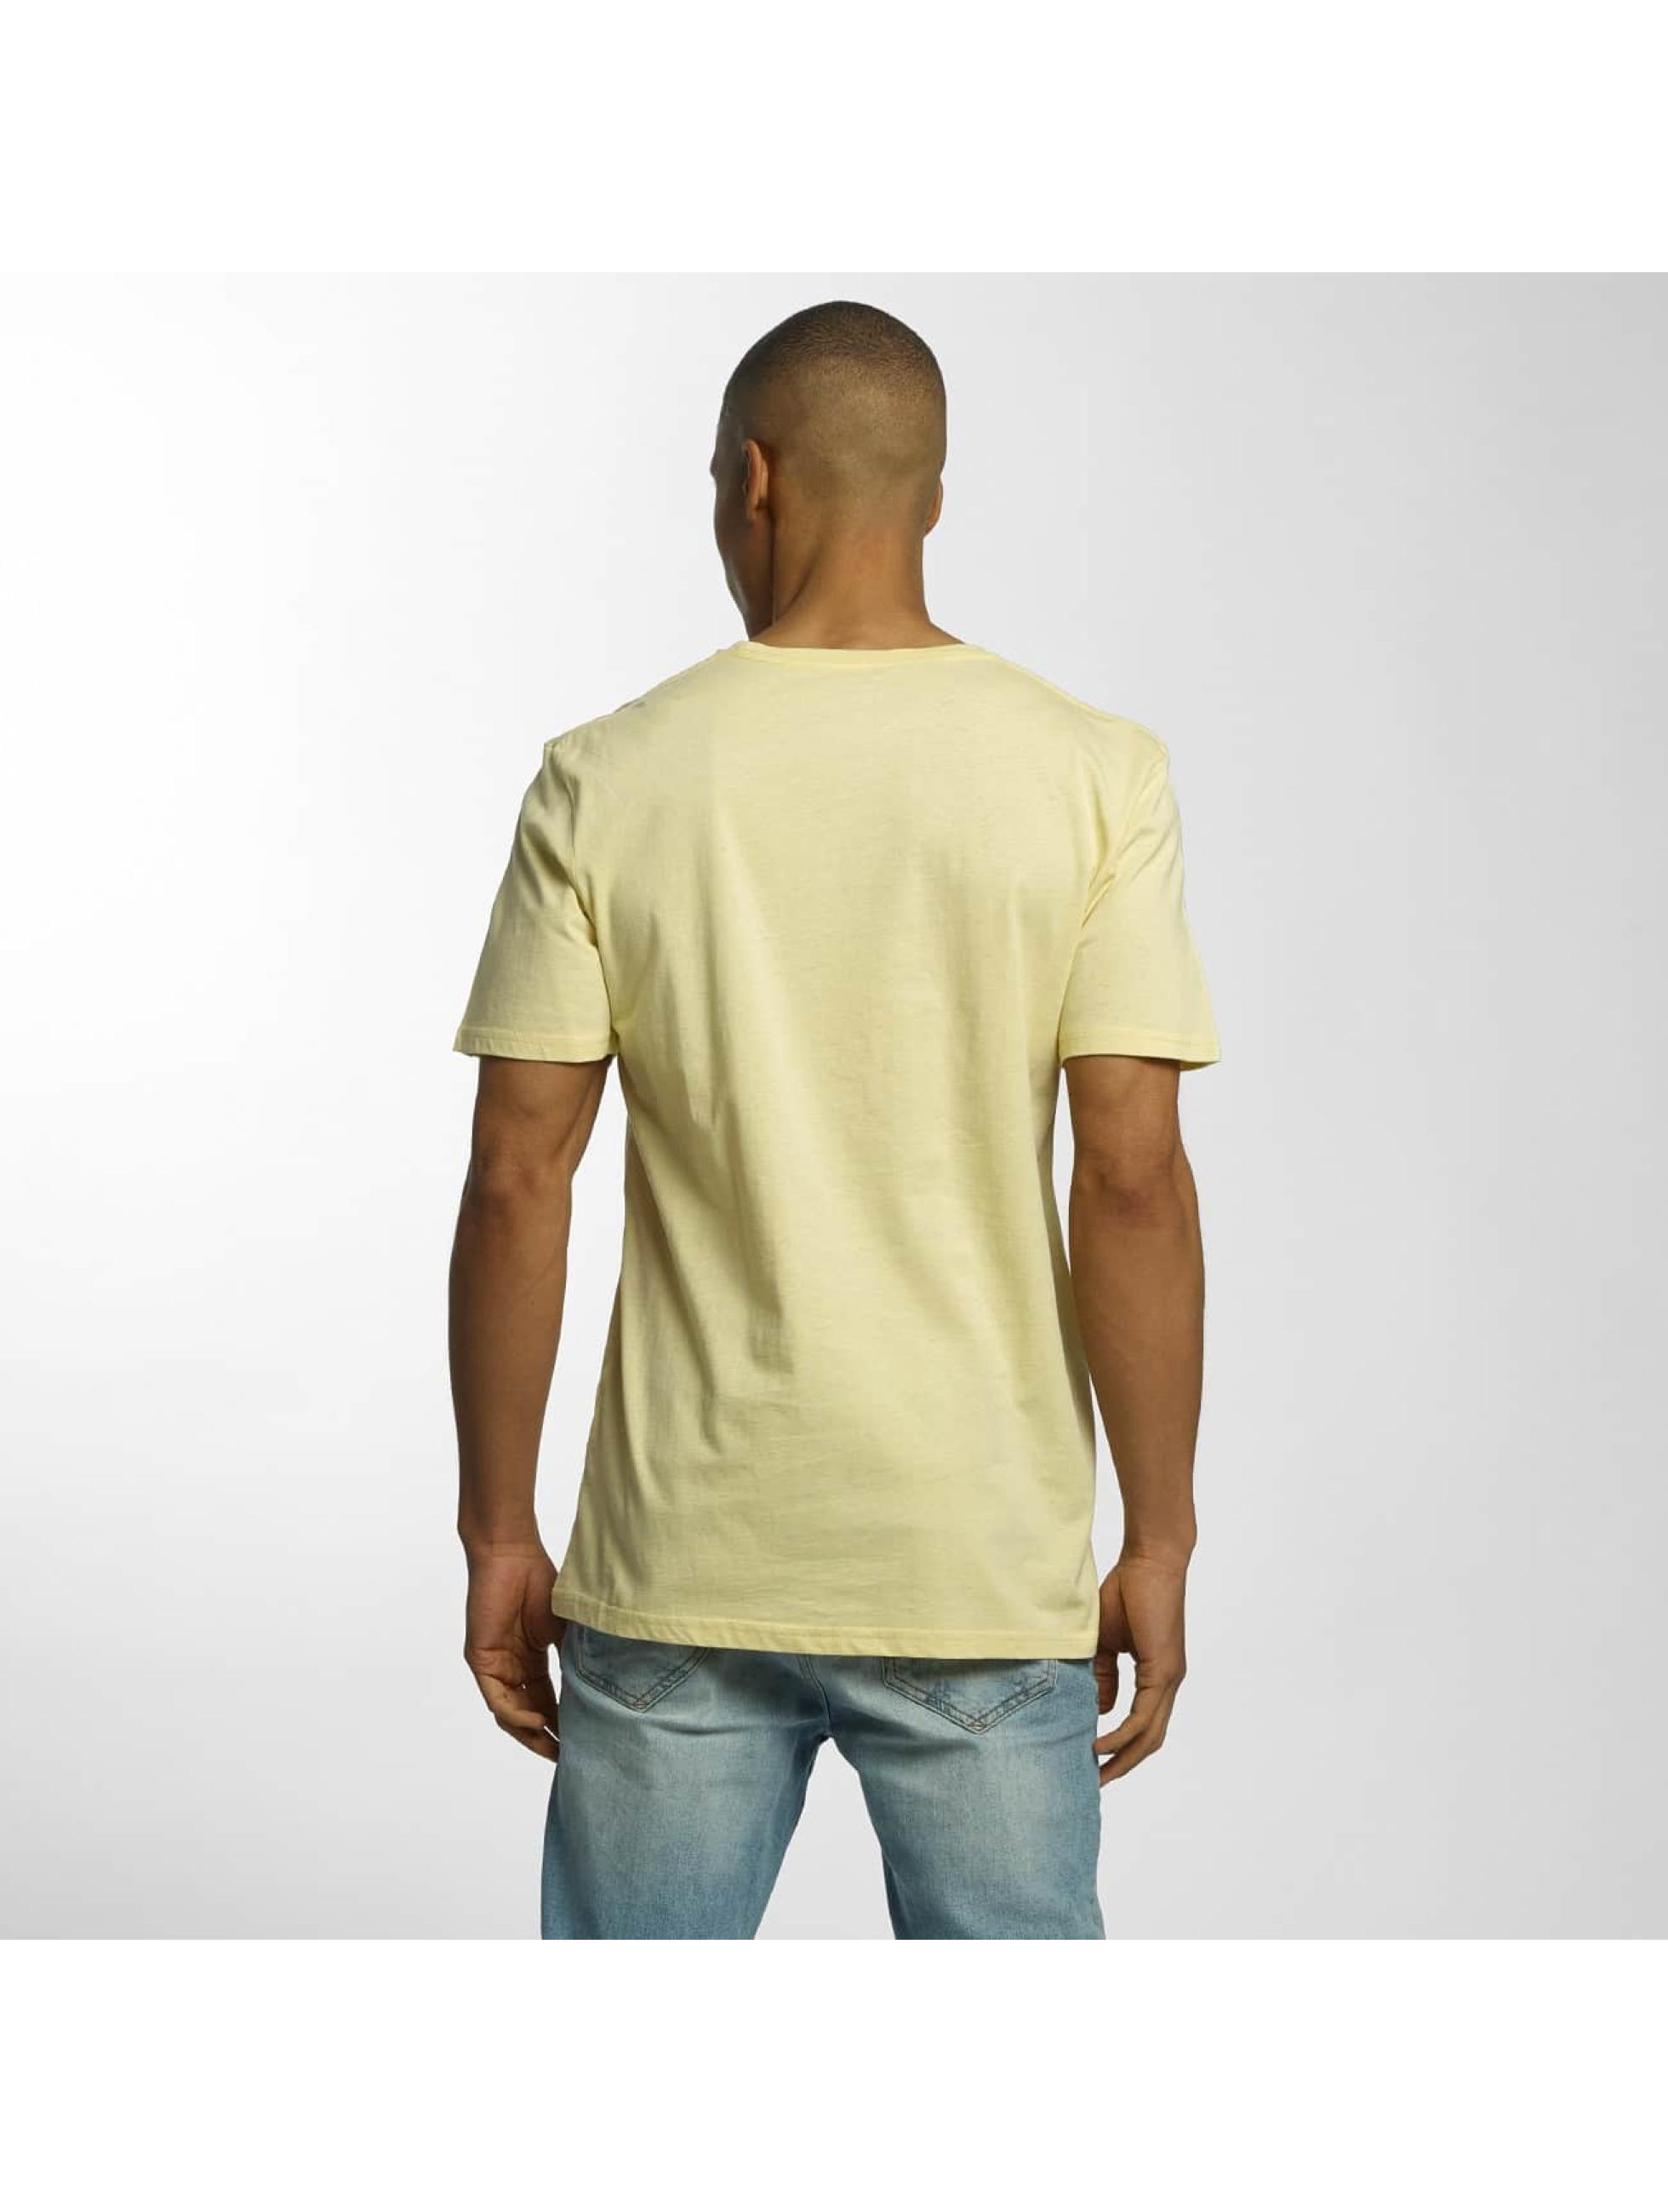 Quiksilver T-Shirt Classic Sea Tales gelb